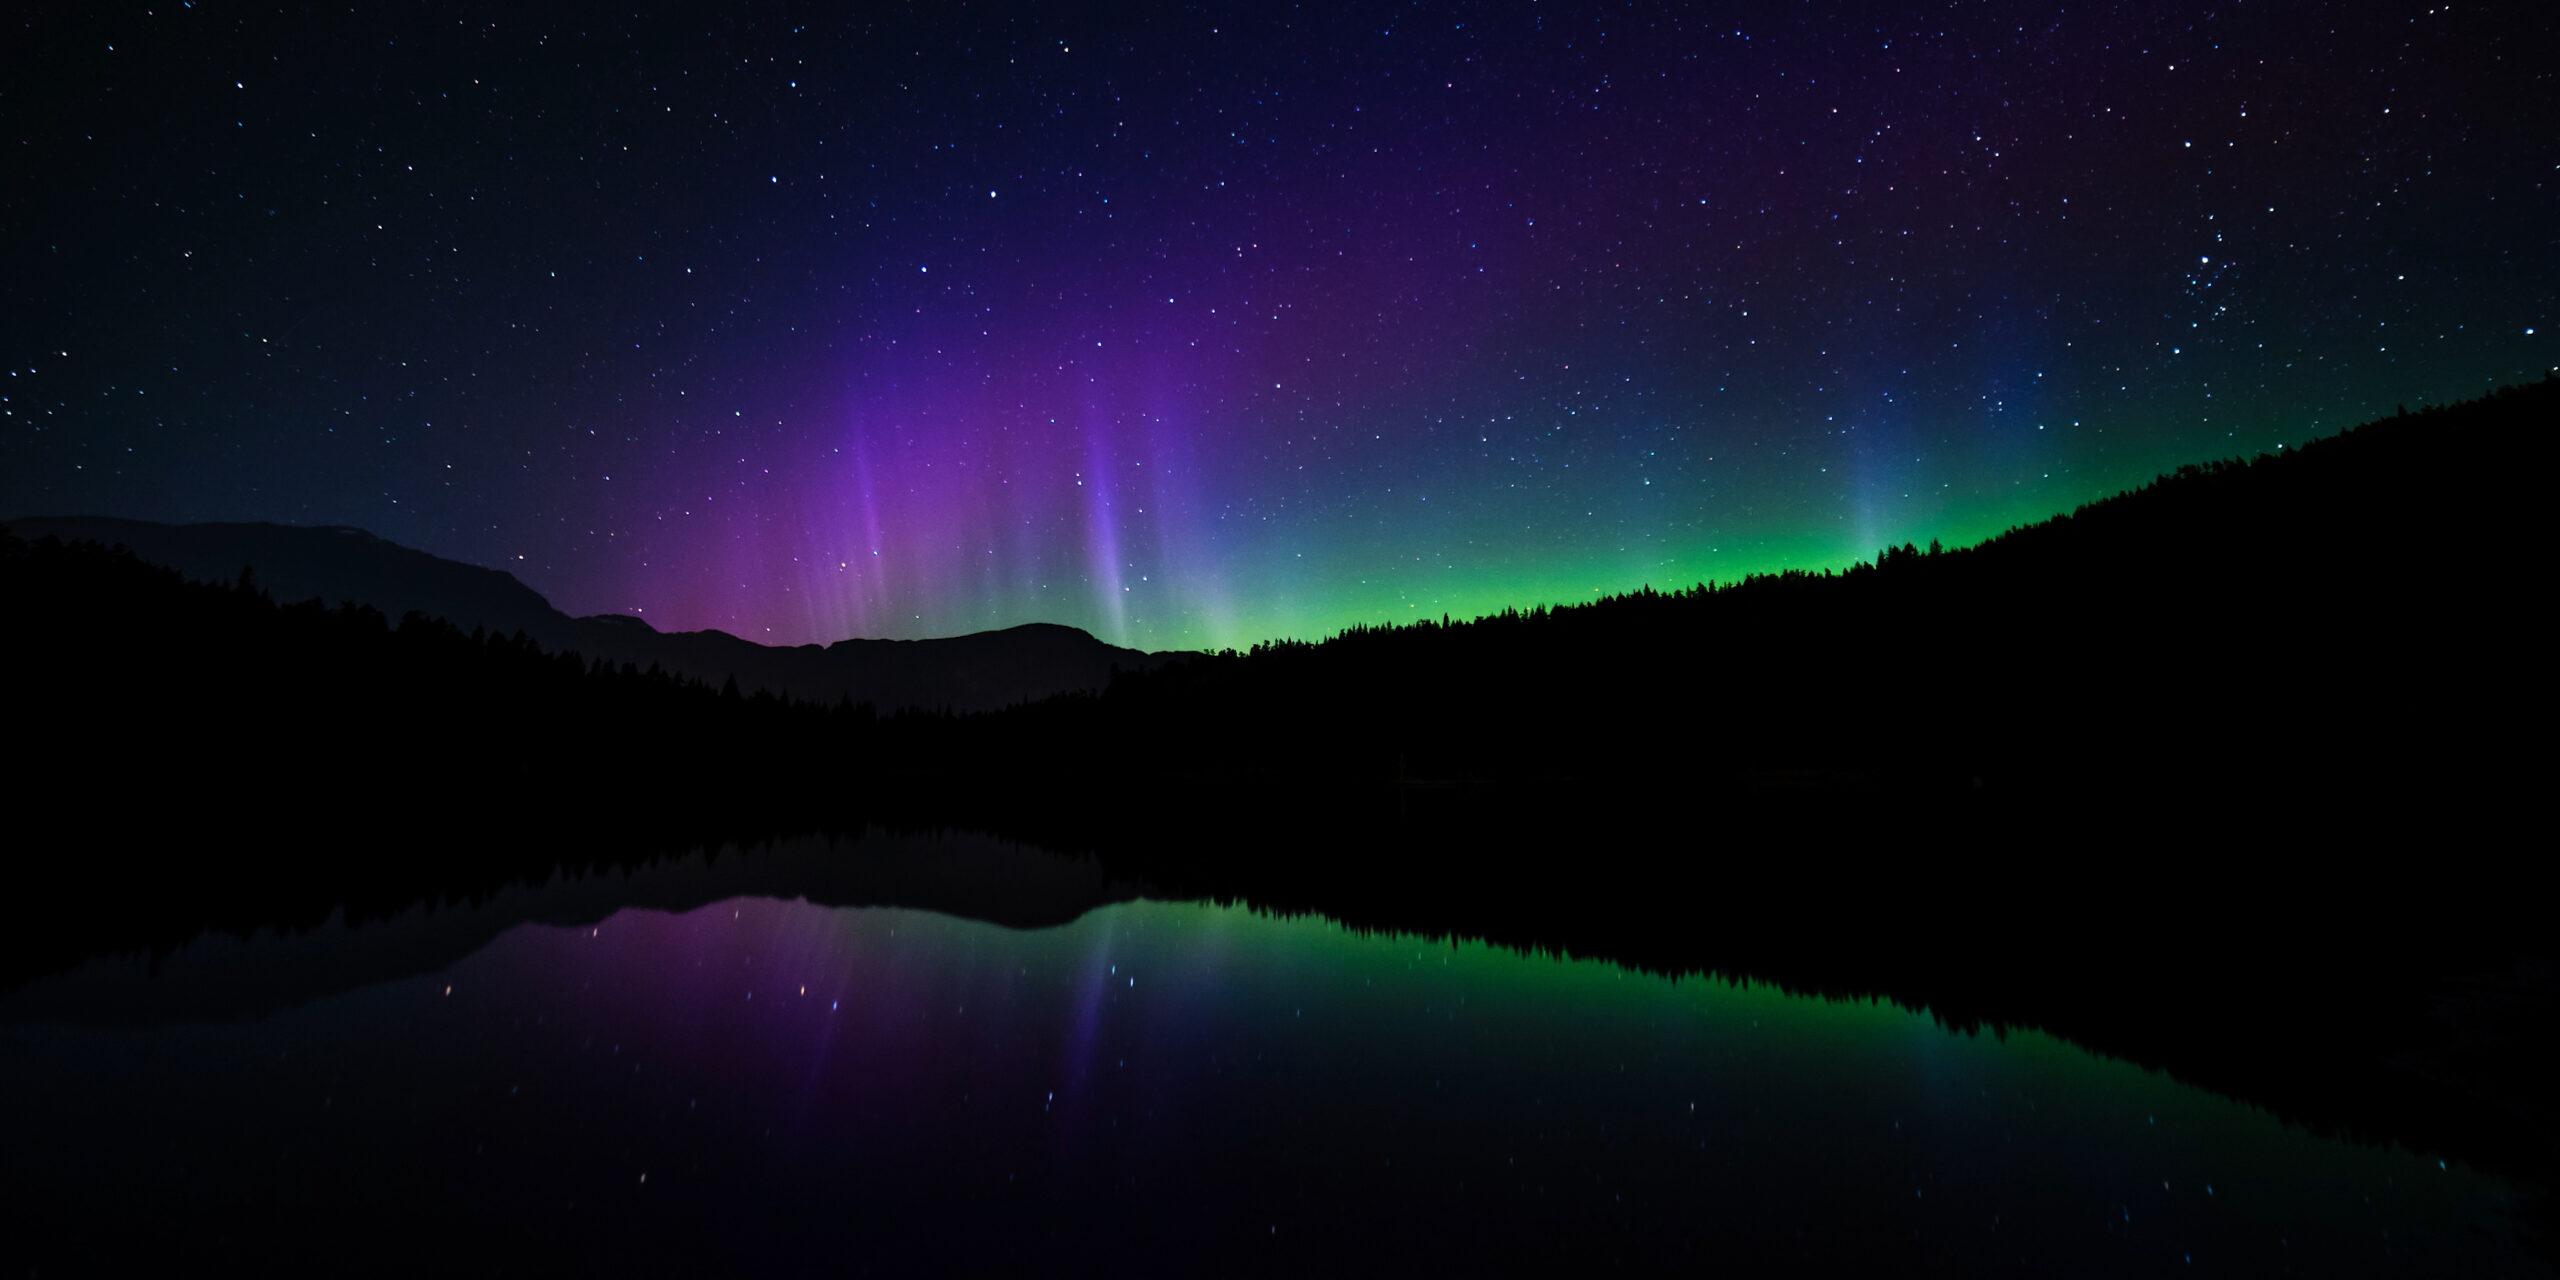 Northern Lights above a calm lake at night